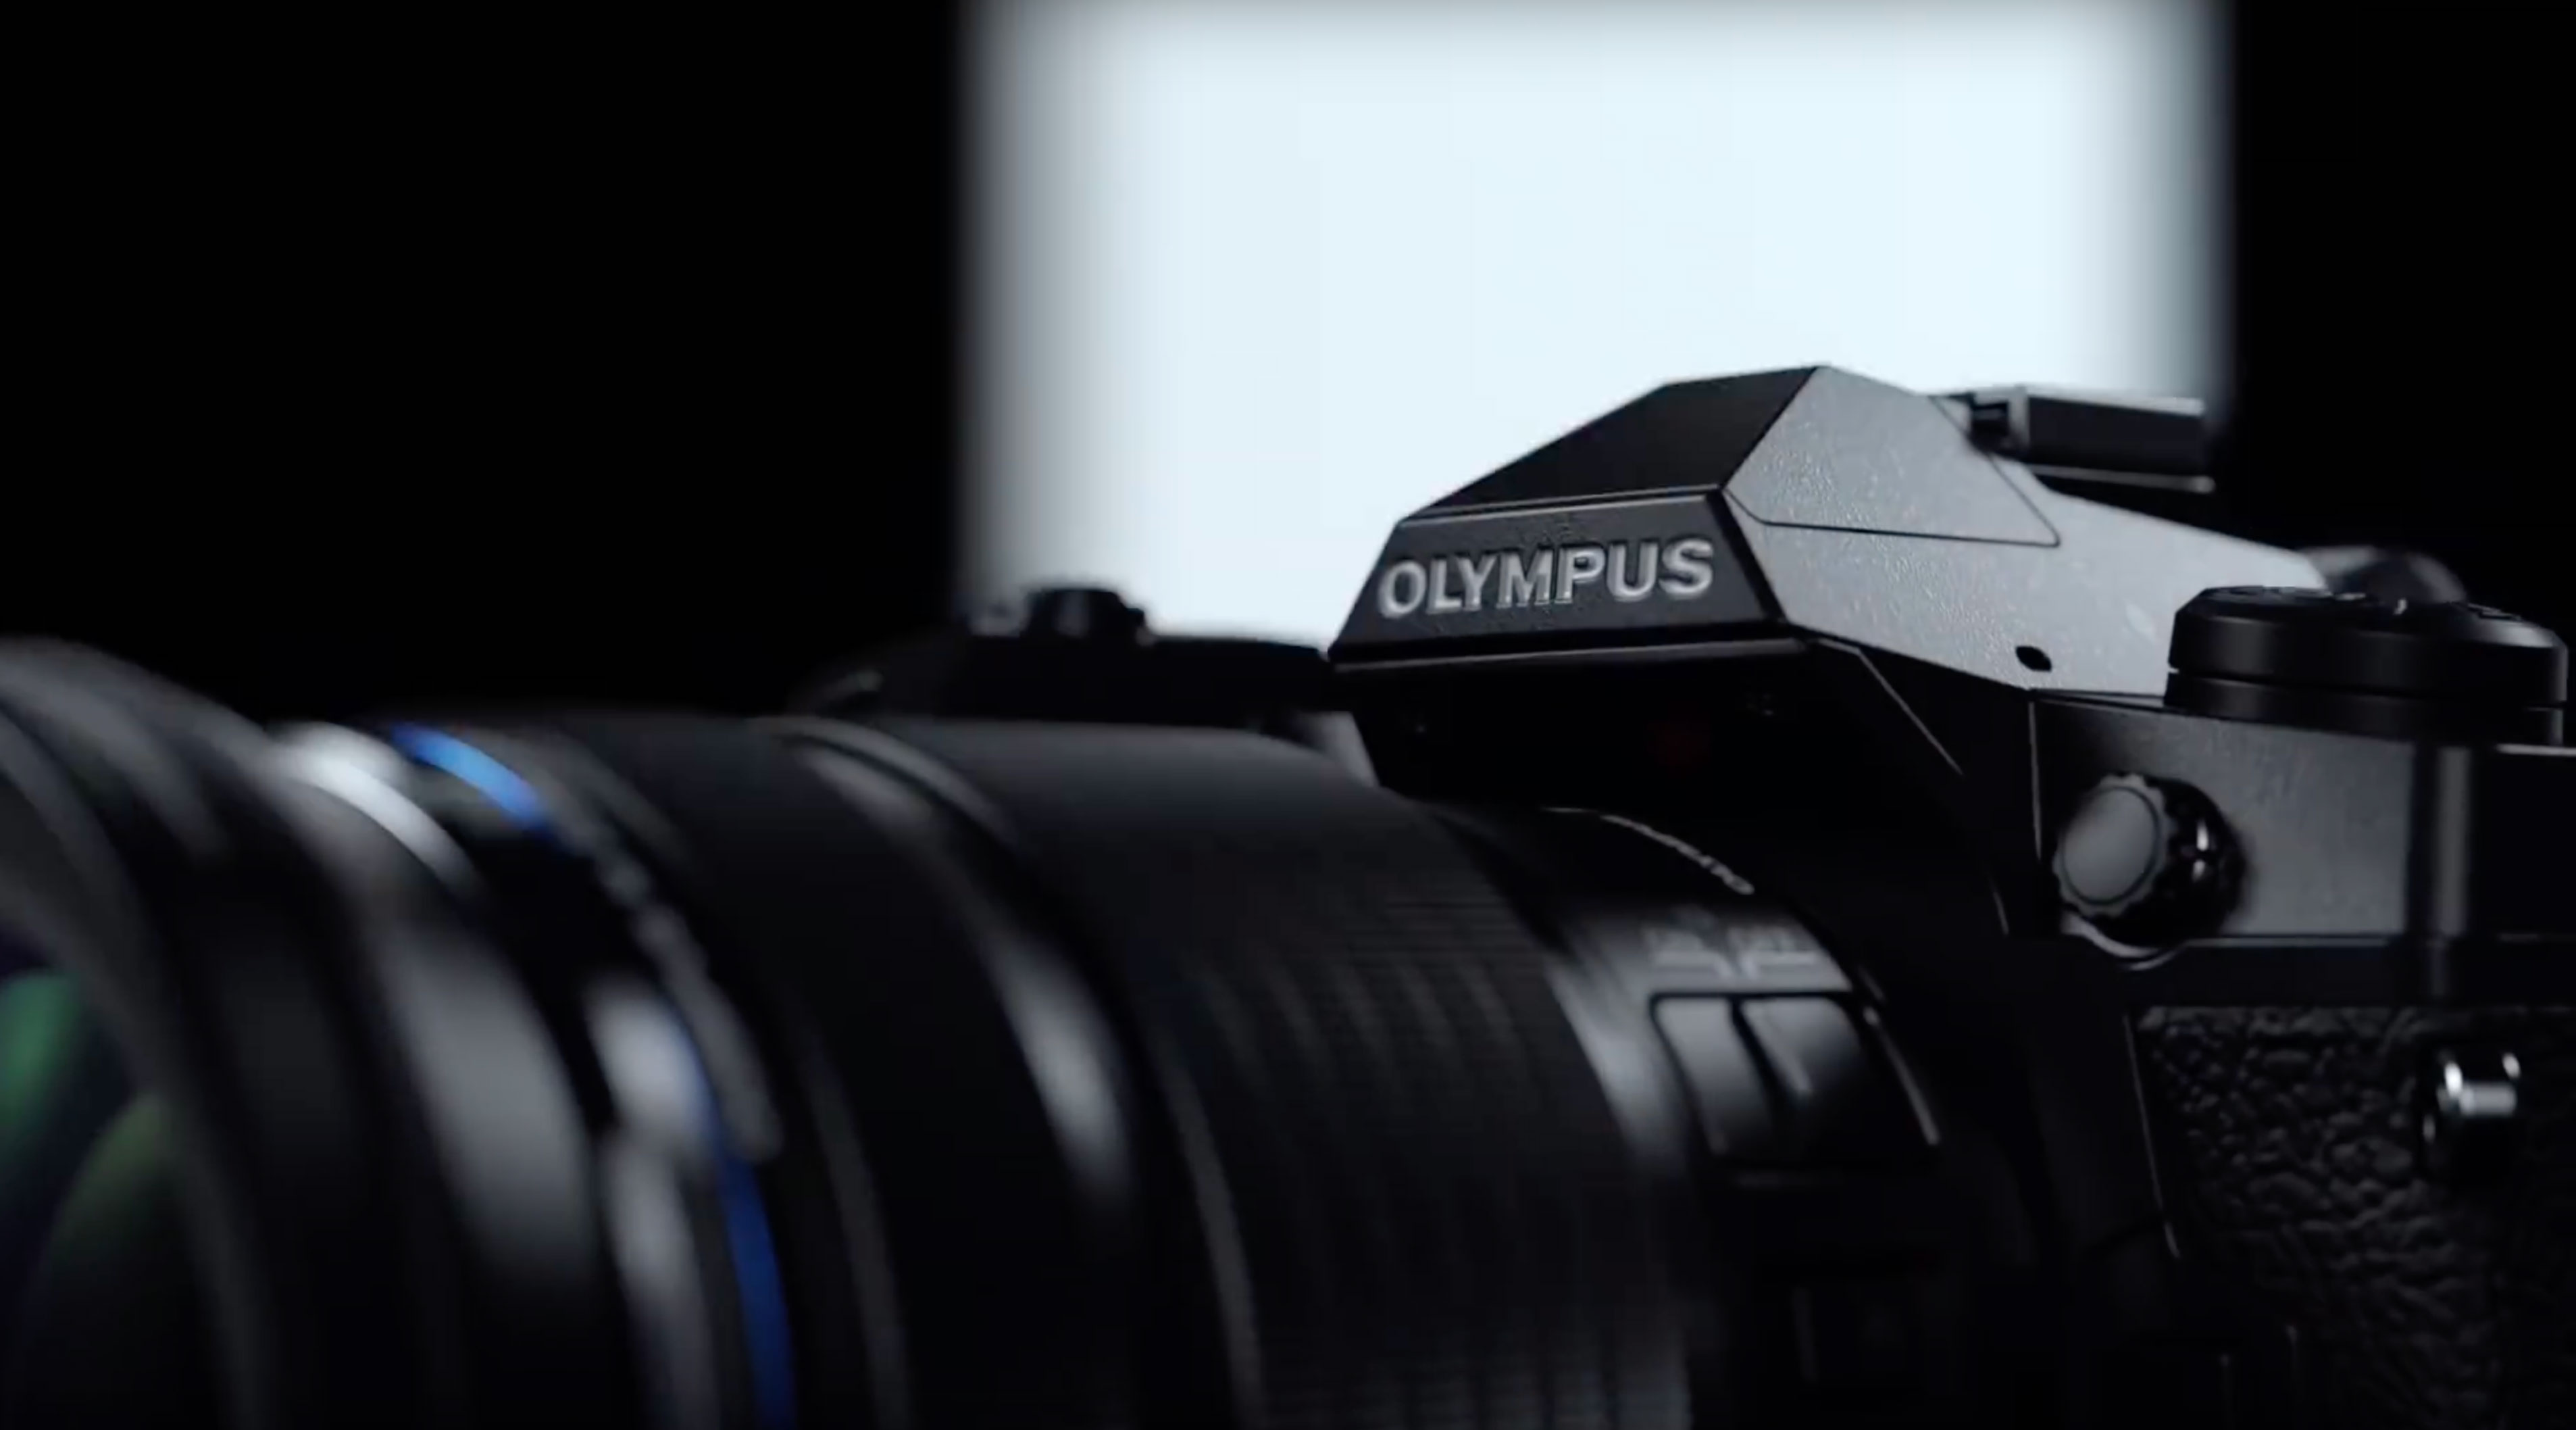 olympus-e-m1x.jpg